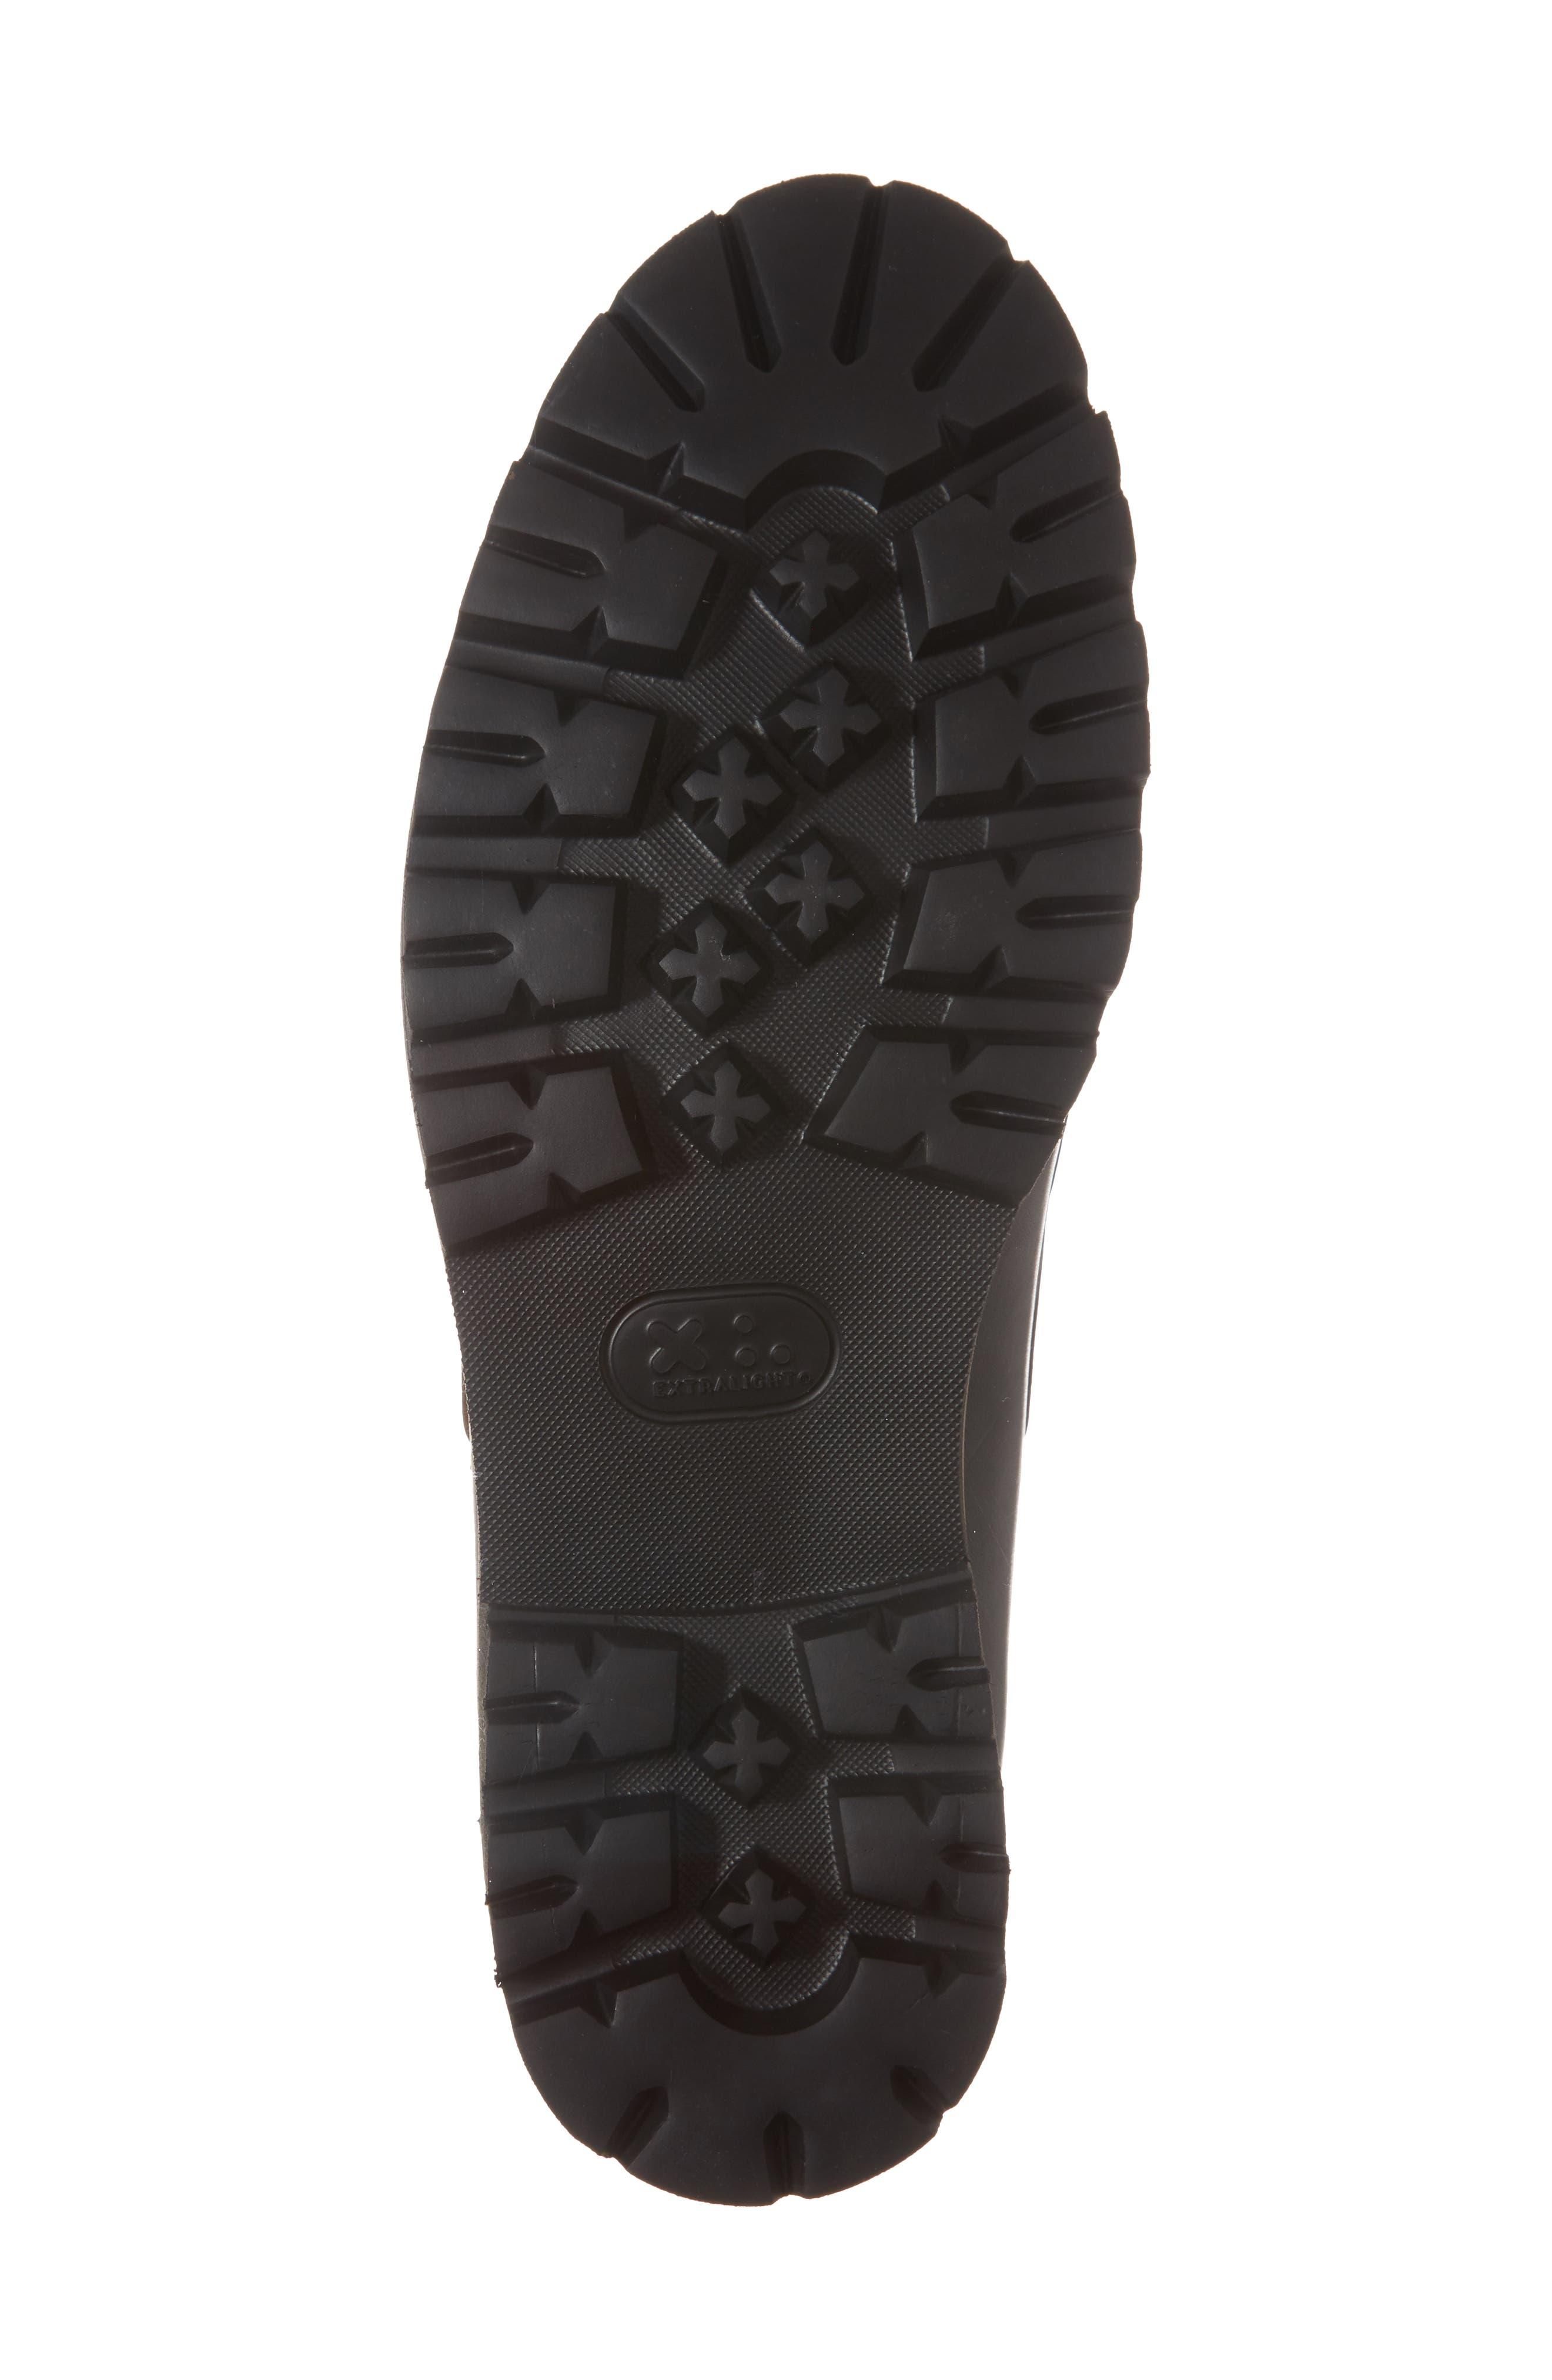 Camplight Water Resistant Boat Shoe,                             Alternate thumbnail 6, color,                             Saddlebag Black Leather